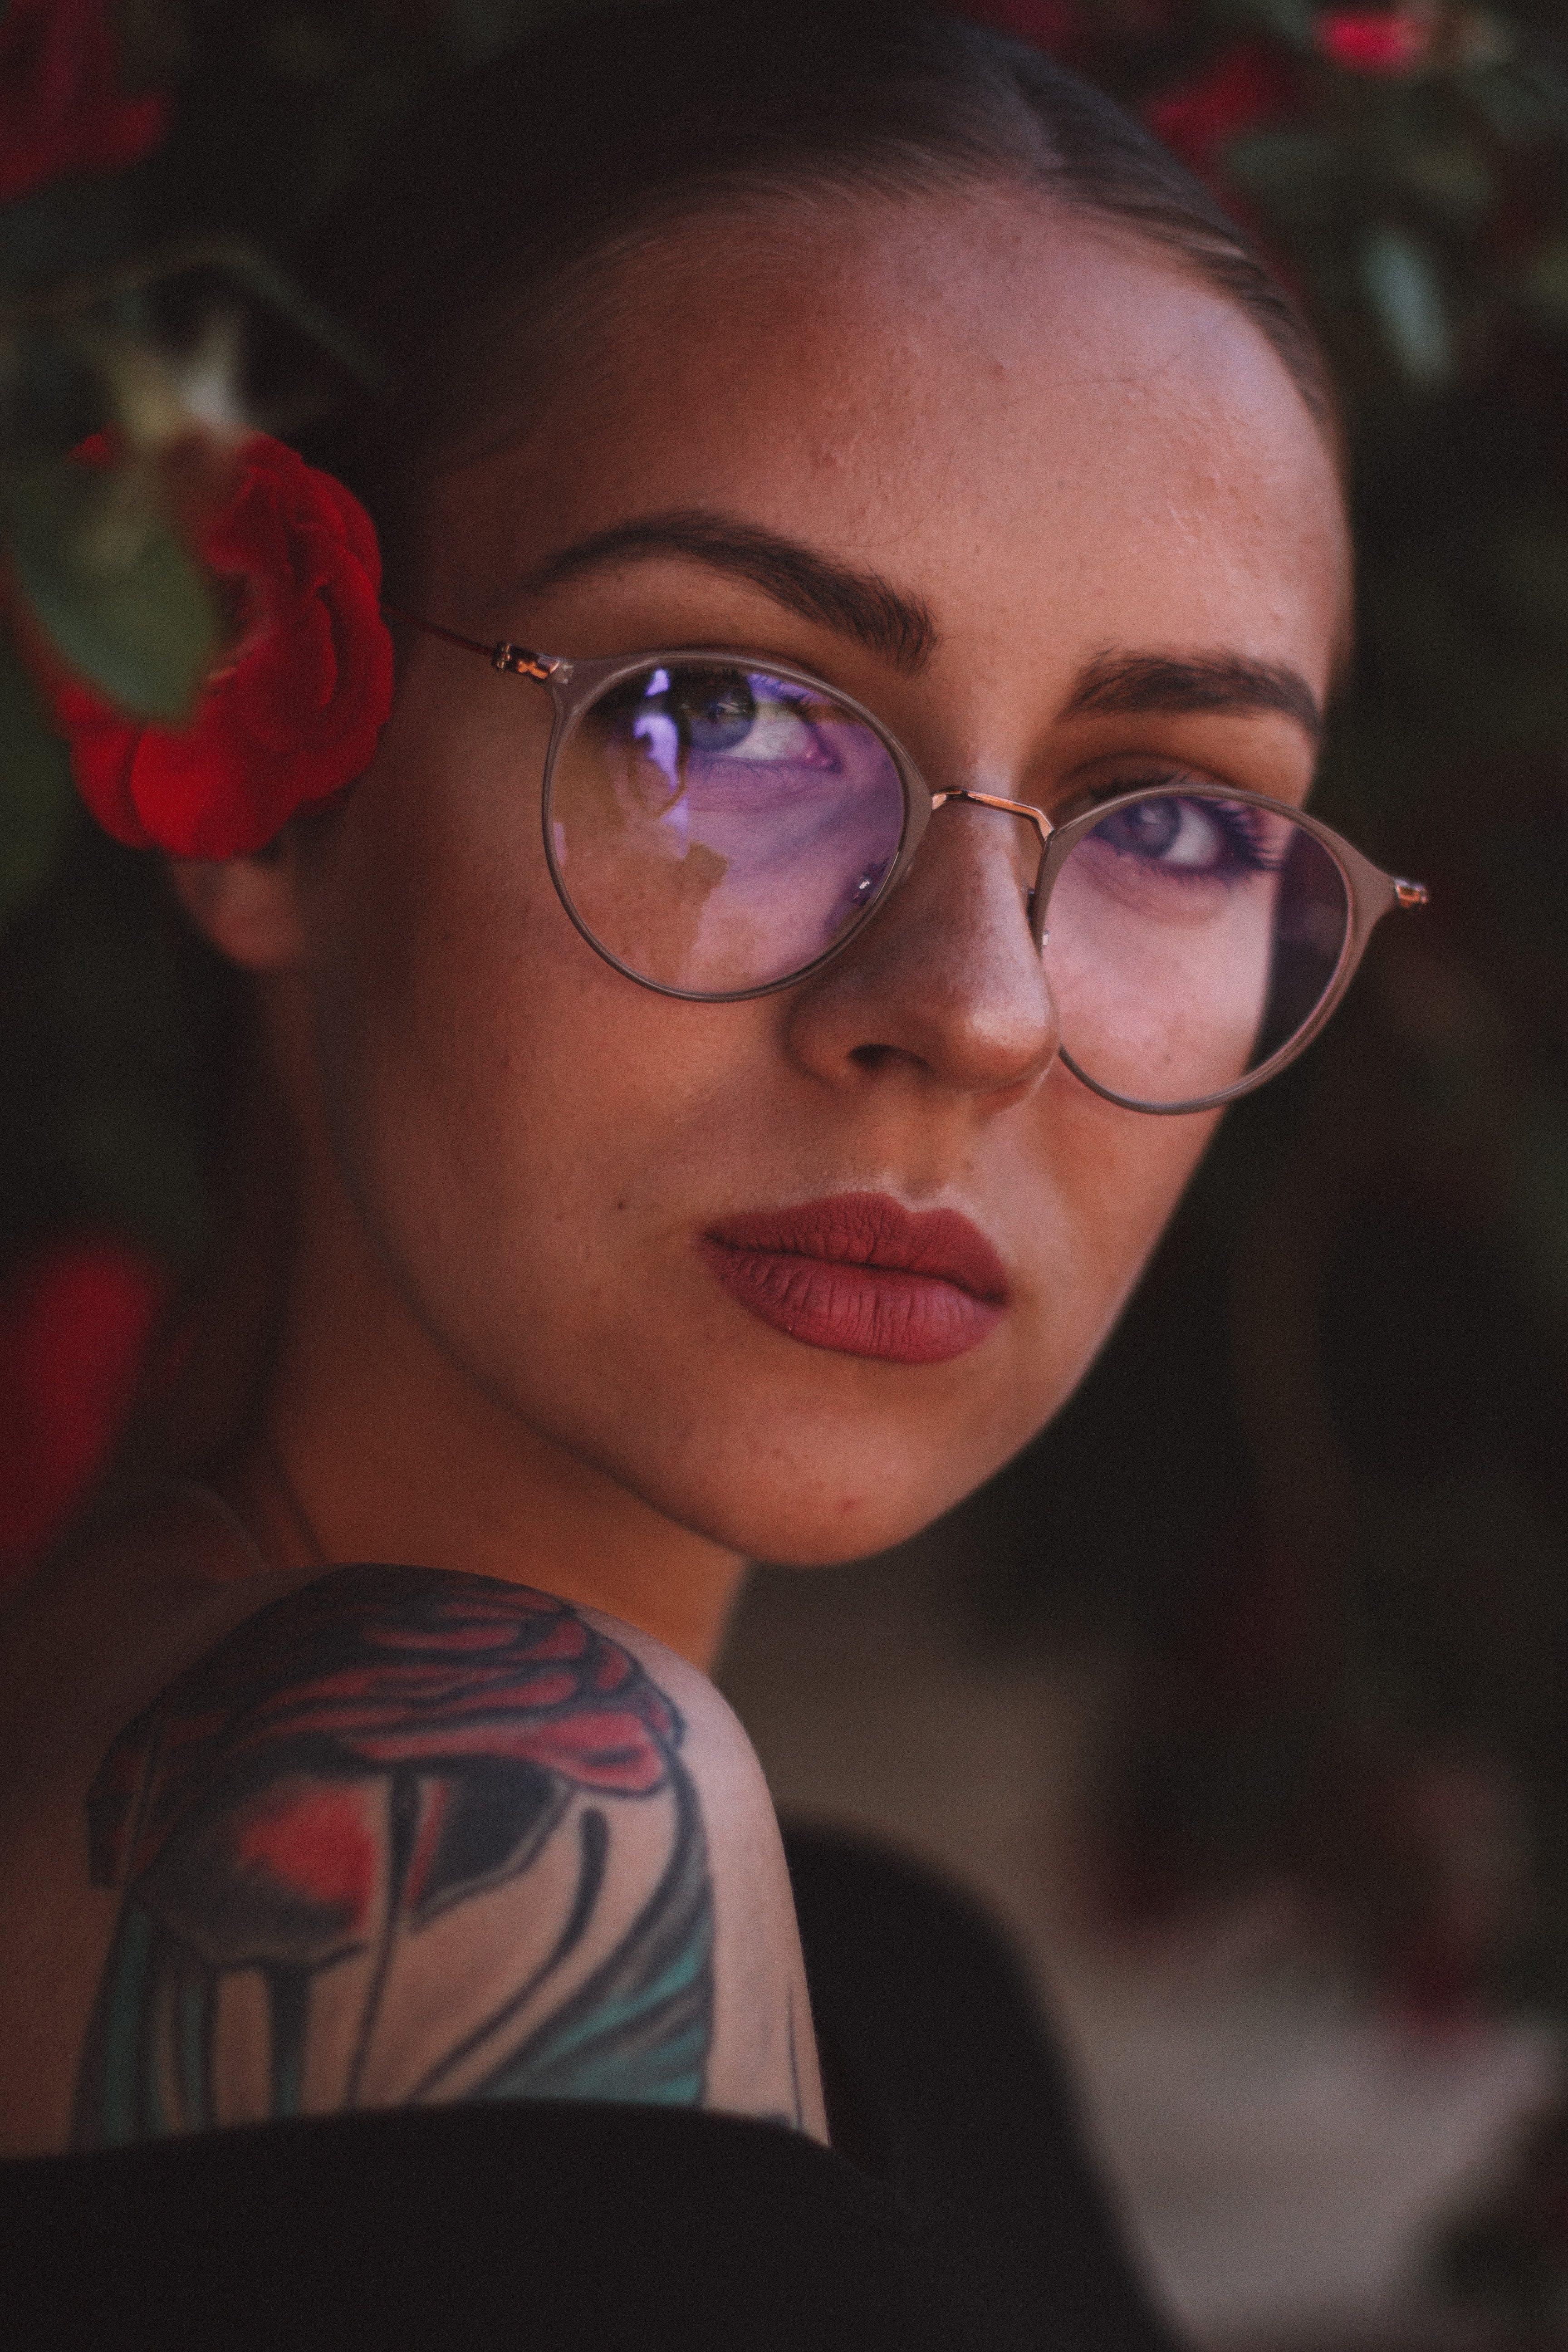 Close-Up Photo of Woman Wearing Eyeglasses